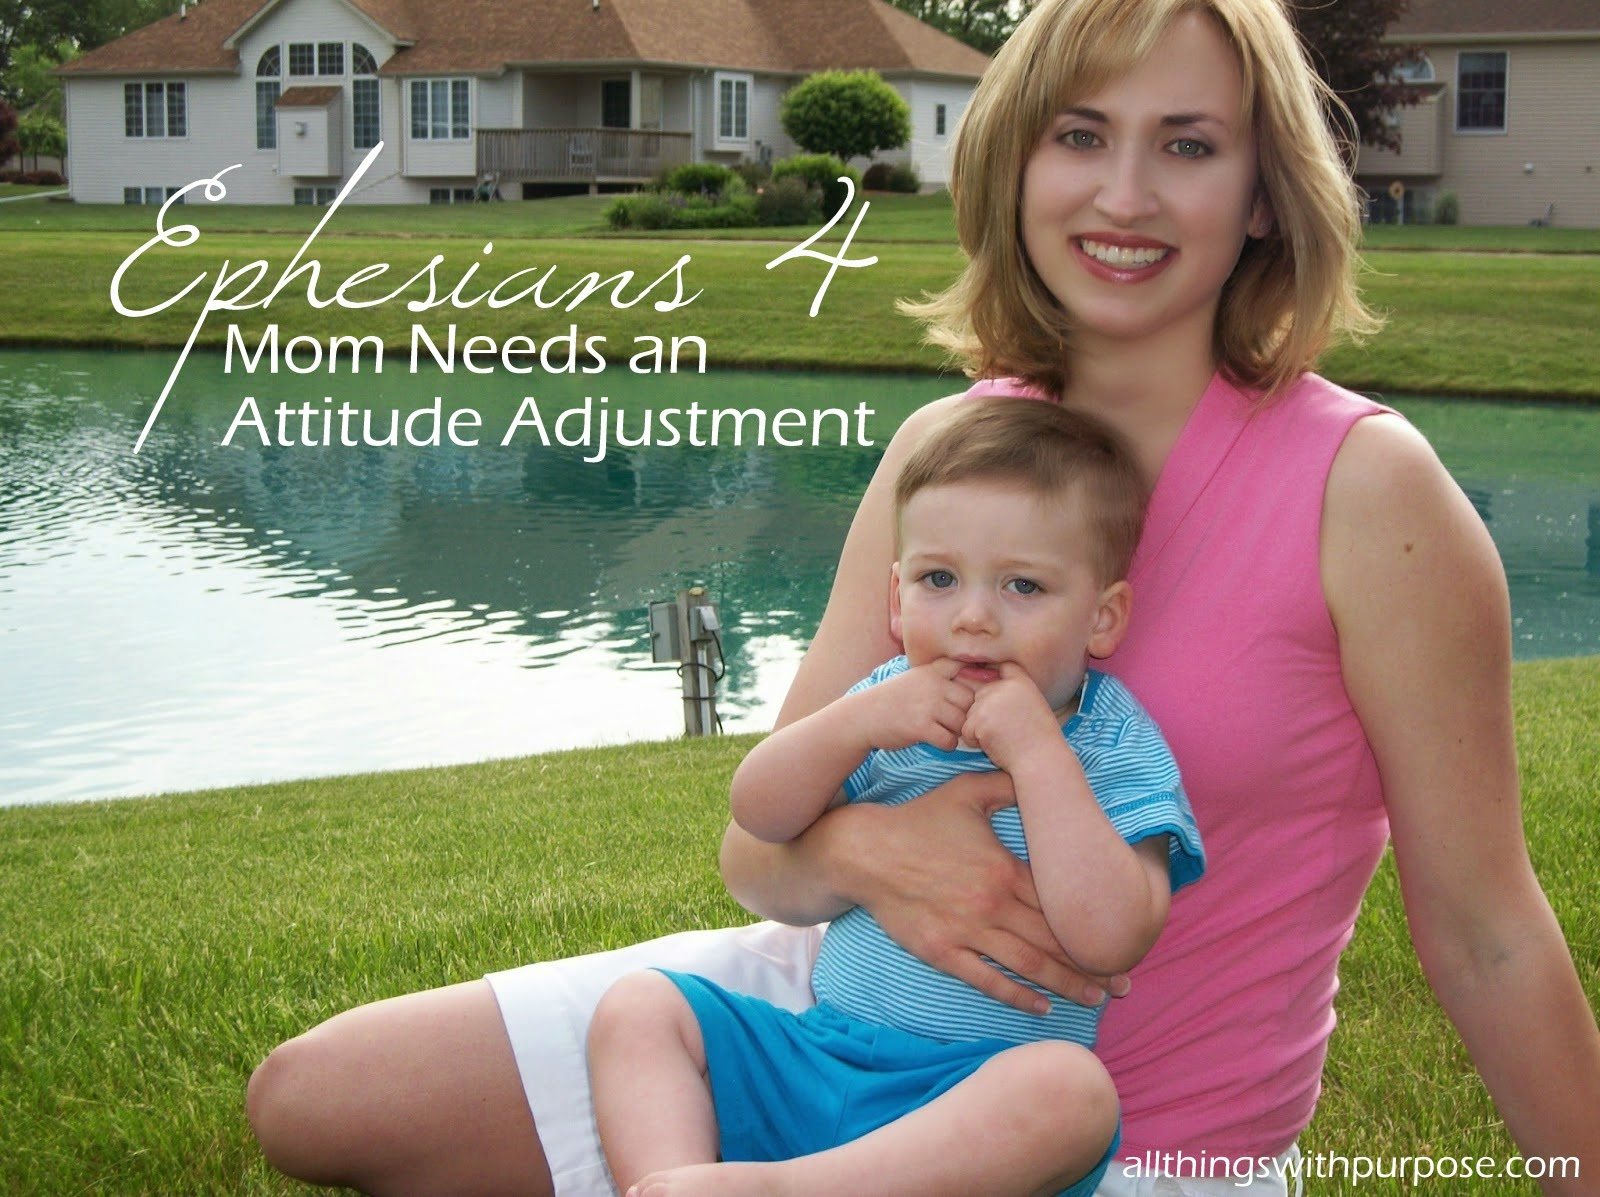 When Mommy Needs an Attitude Adjustment